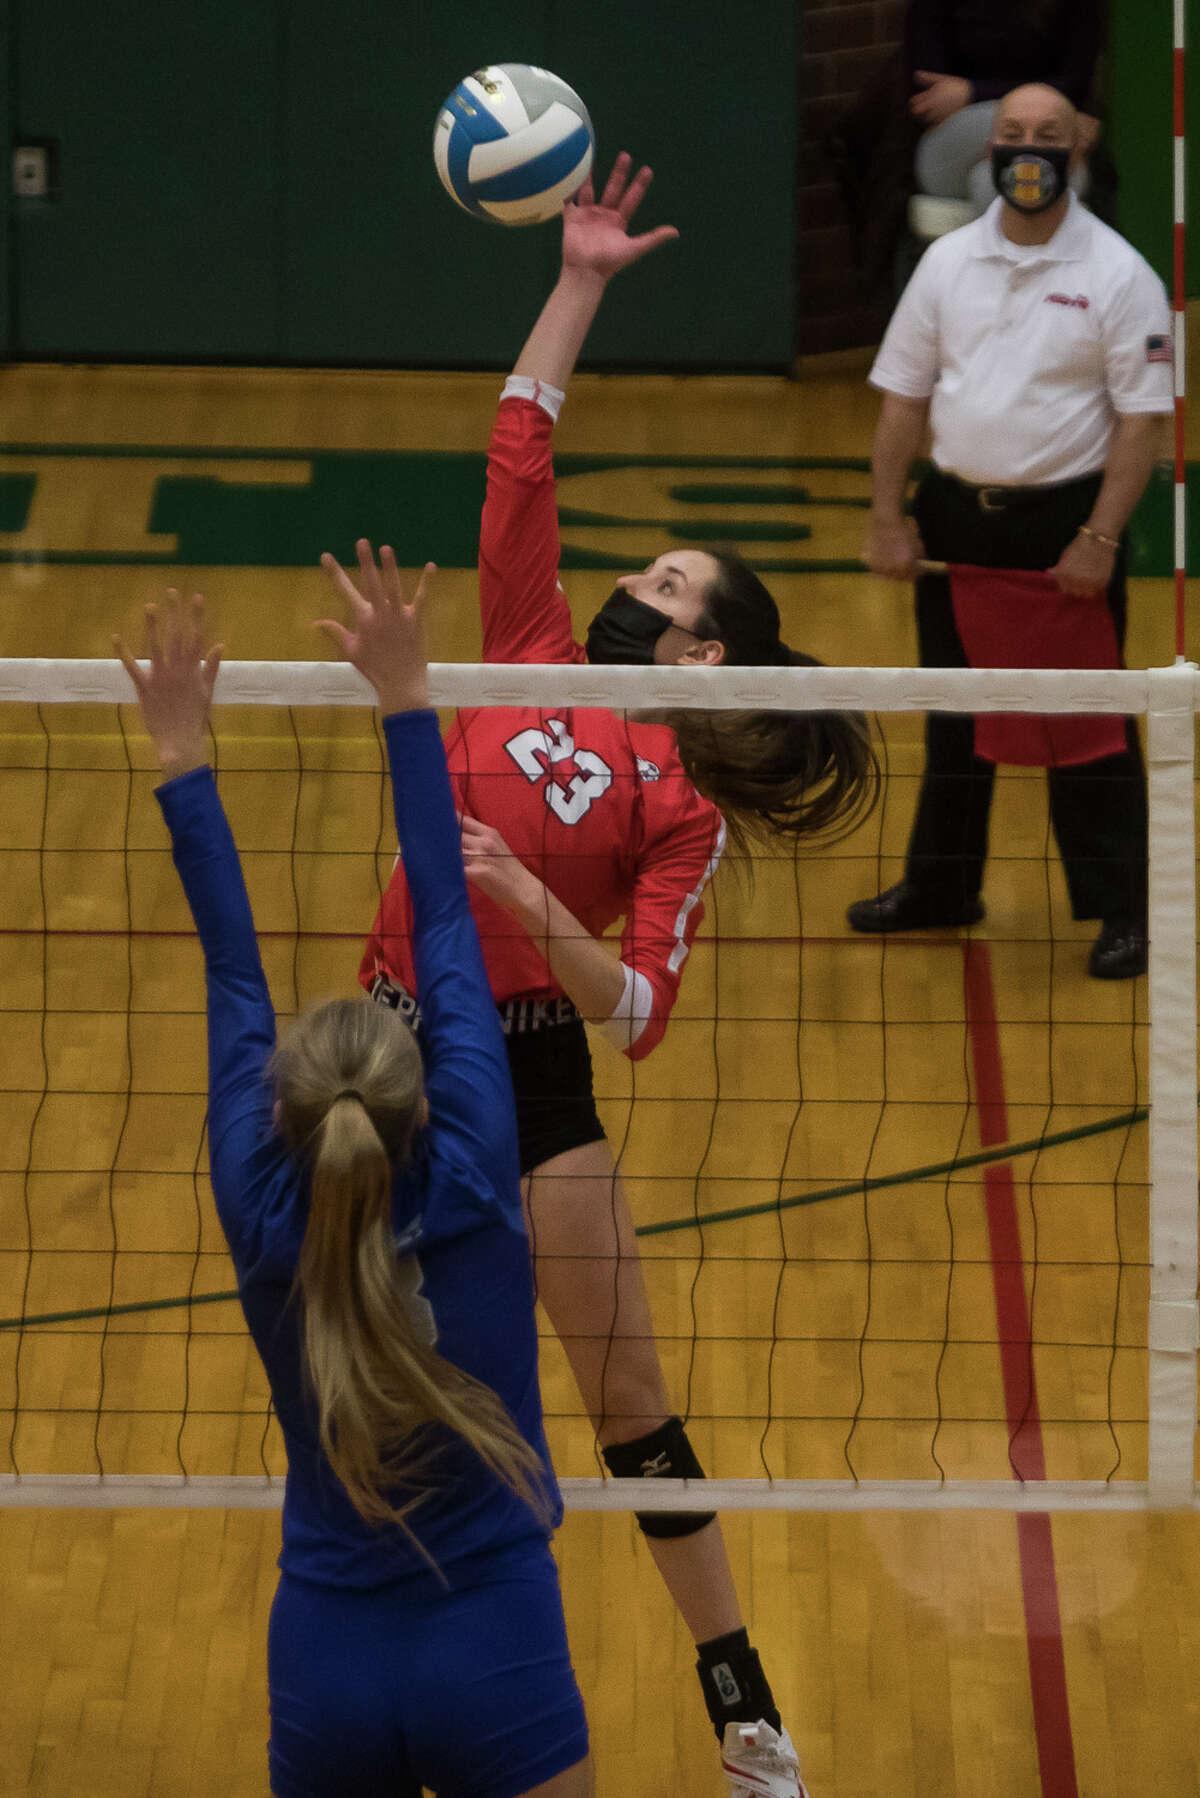 Beaverton's Hannah Stearns spikes the ball during the Beavers' state quarterfinal victory over Calumet Tuesday, Jan. 12, 2021 at Houghton Lake High School. (Katy Kildee/kkildee@mdn.net)